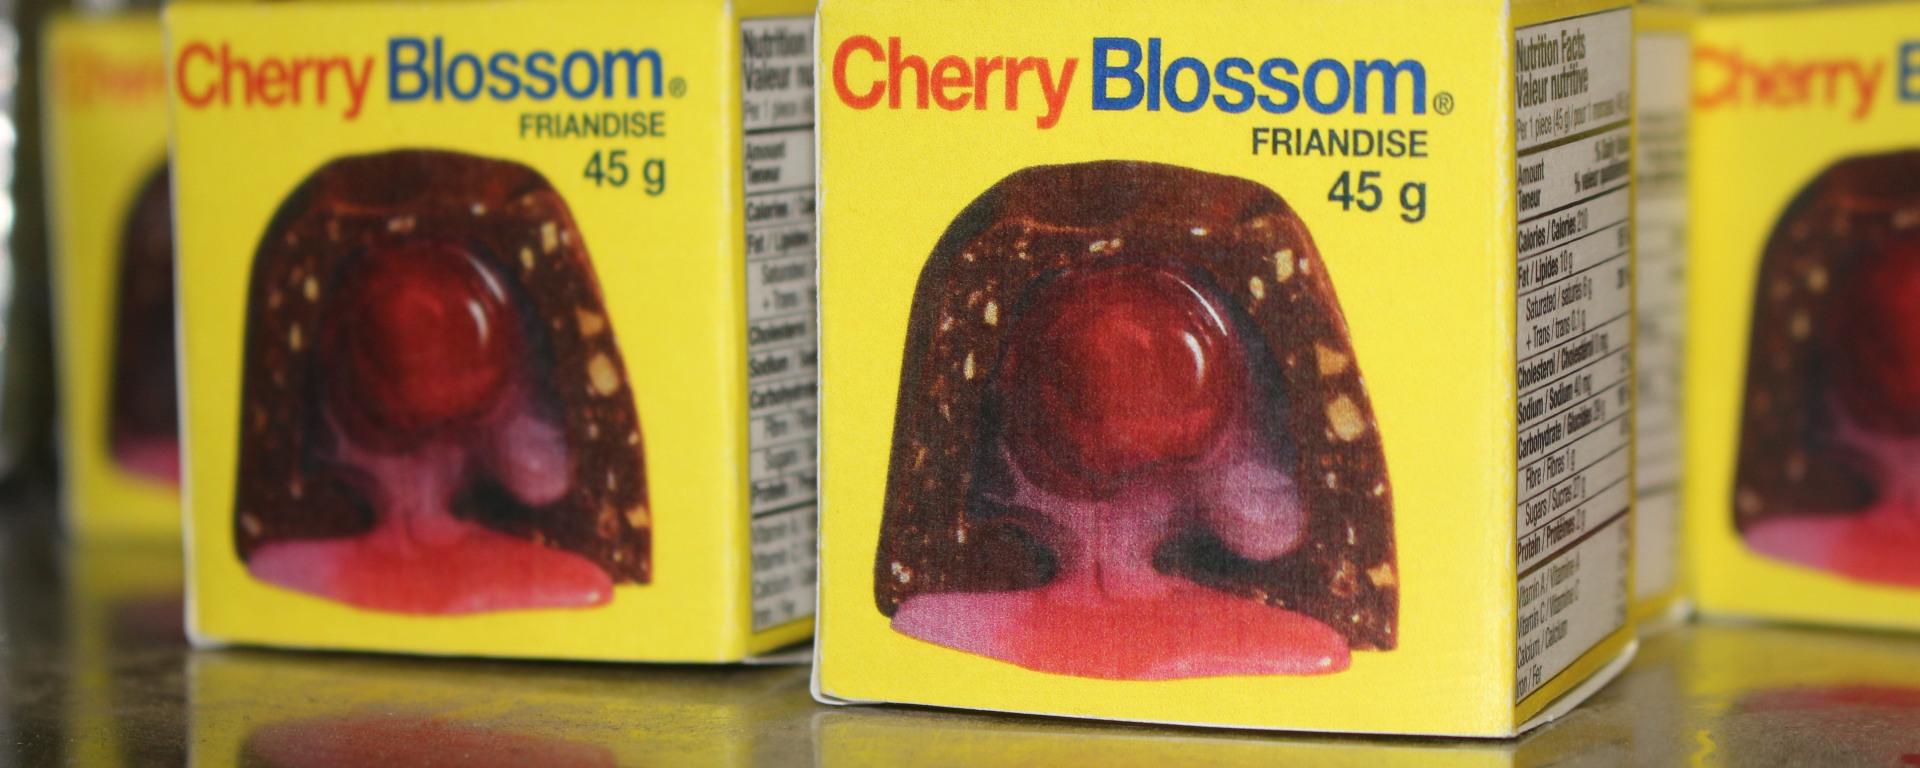 Cherry-Blossom-candy